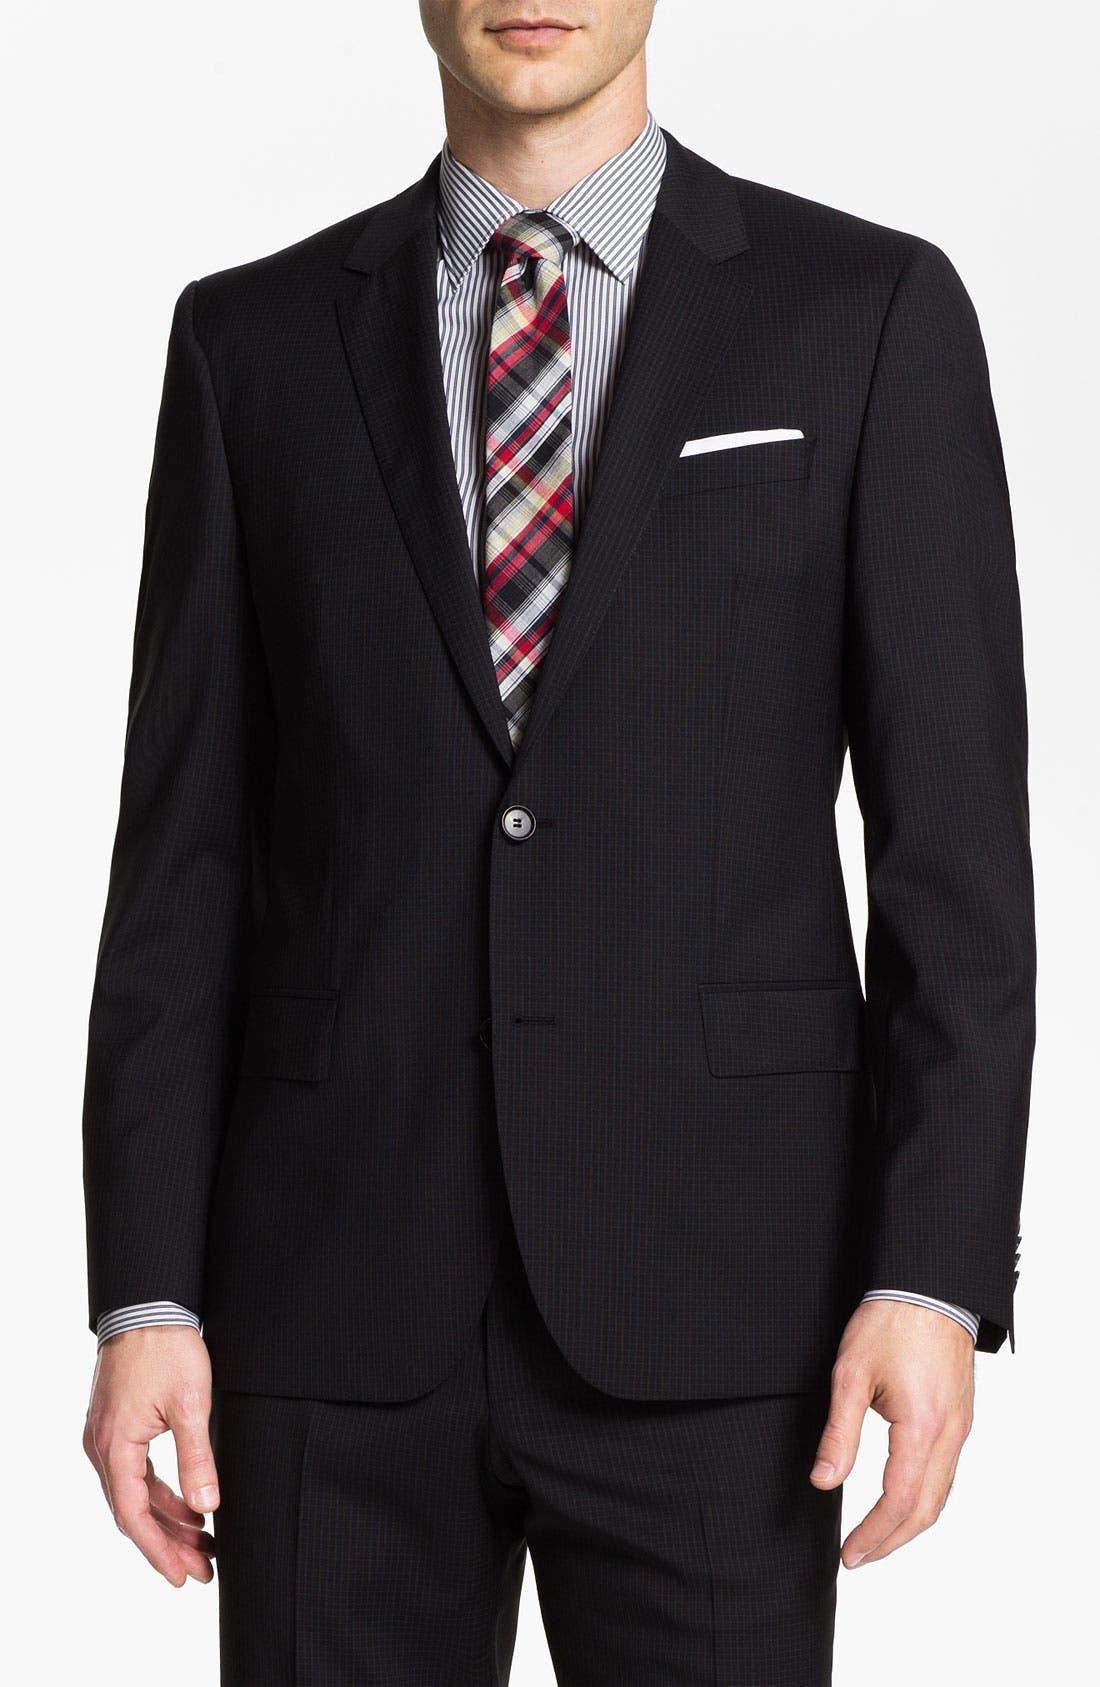 Alternate Image 1 Selected - BOSS Black 'Huge/Genius' Trim Fit Suit